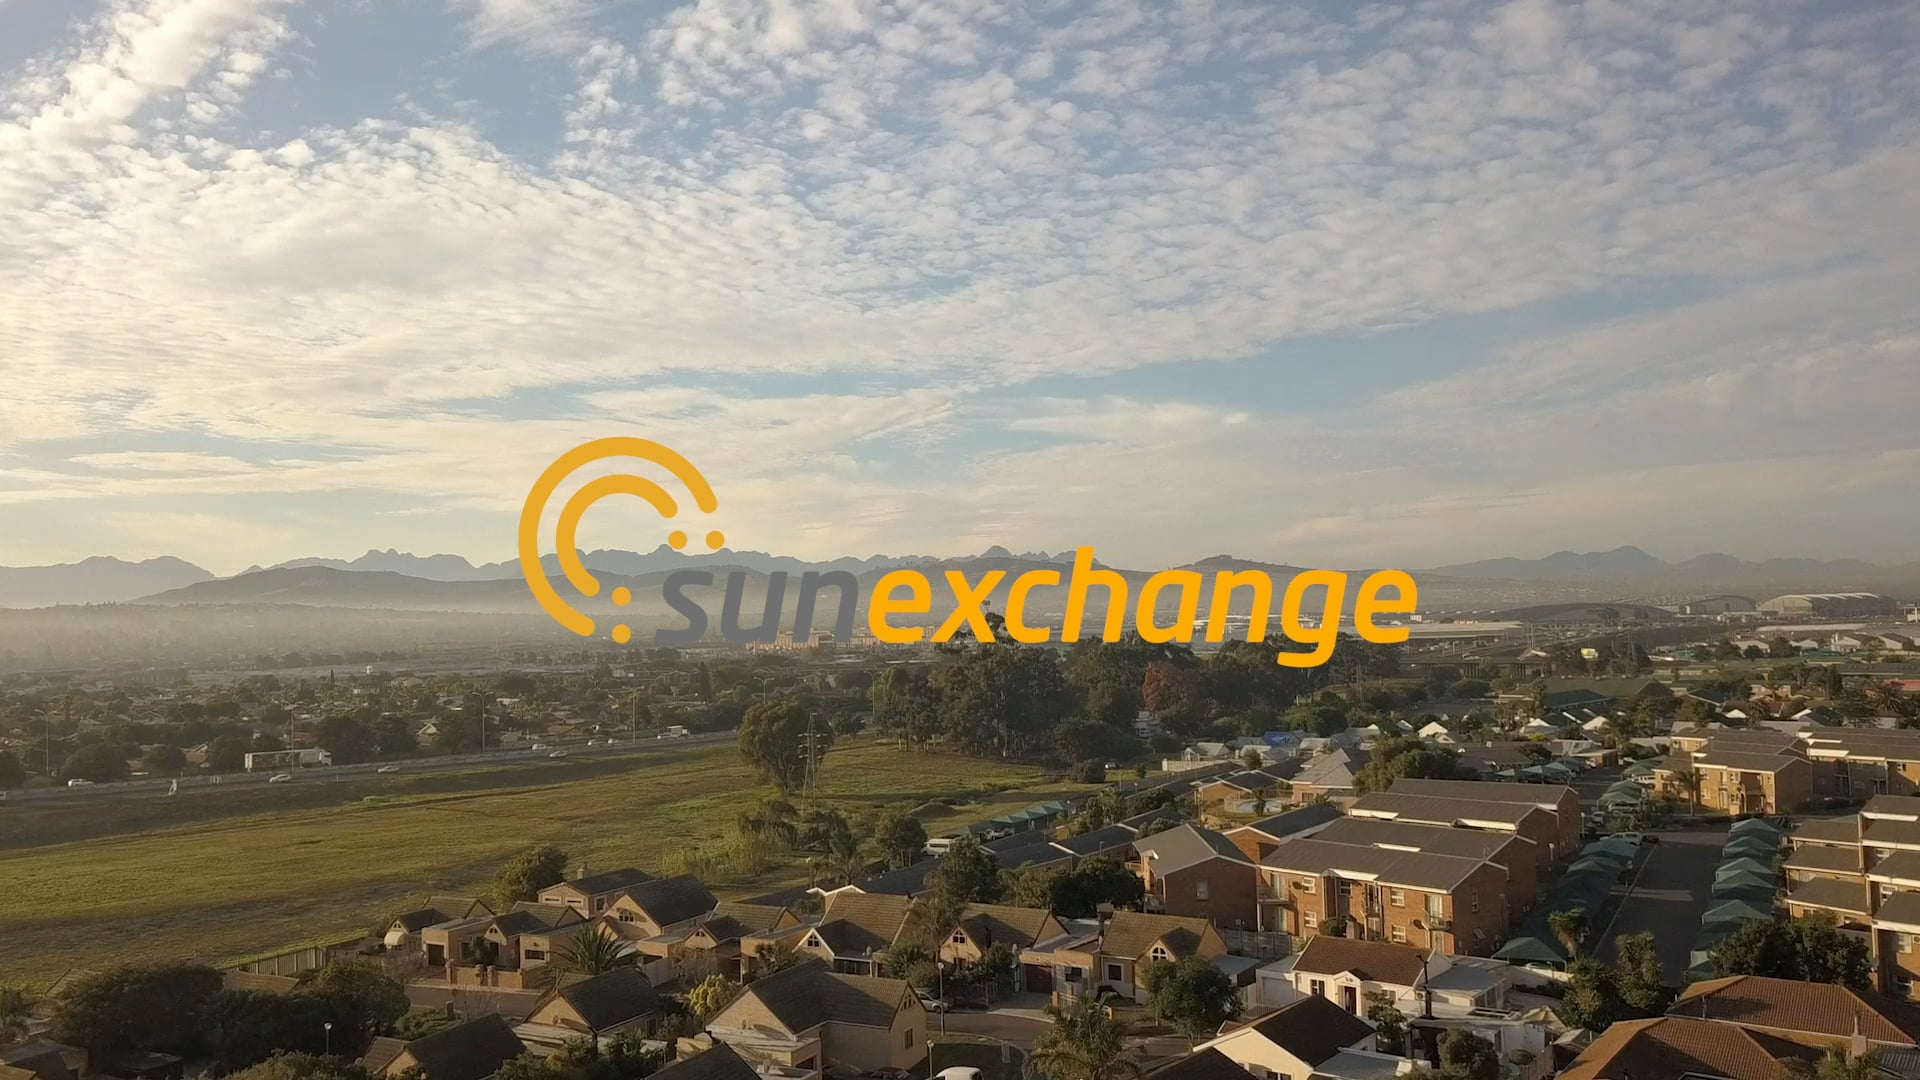 SunExchange Welverdiend